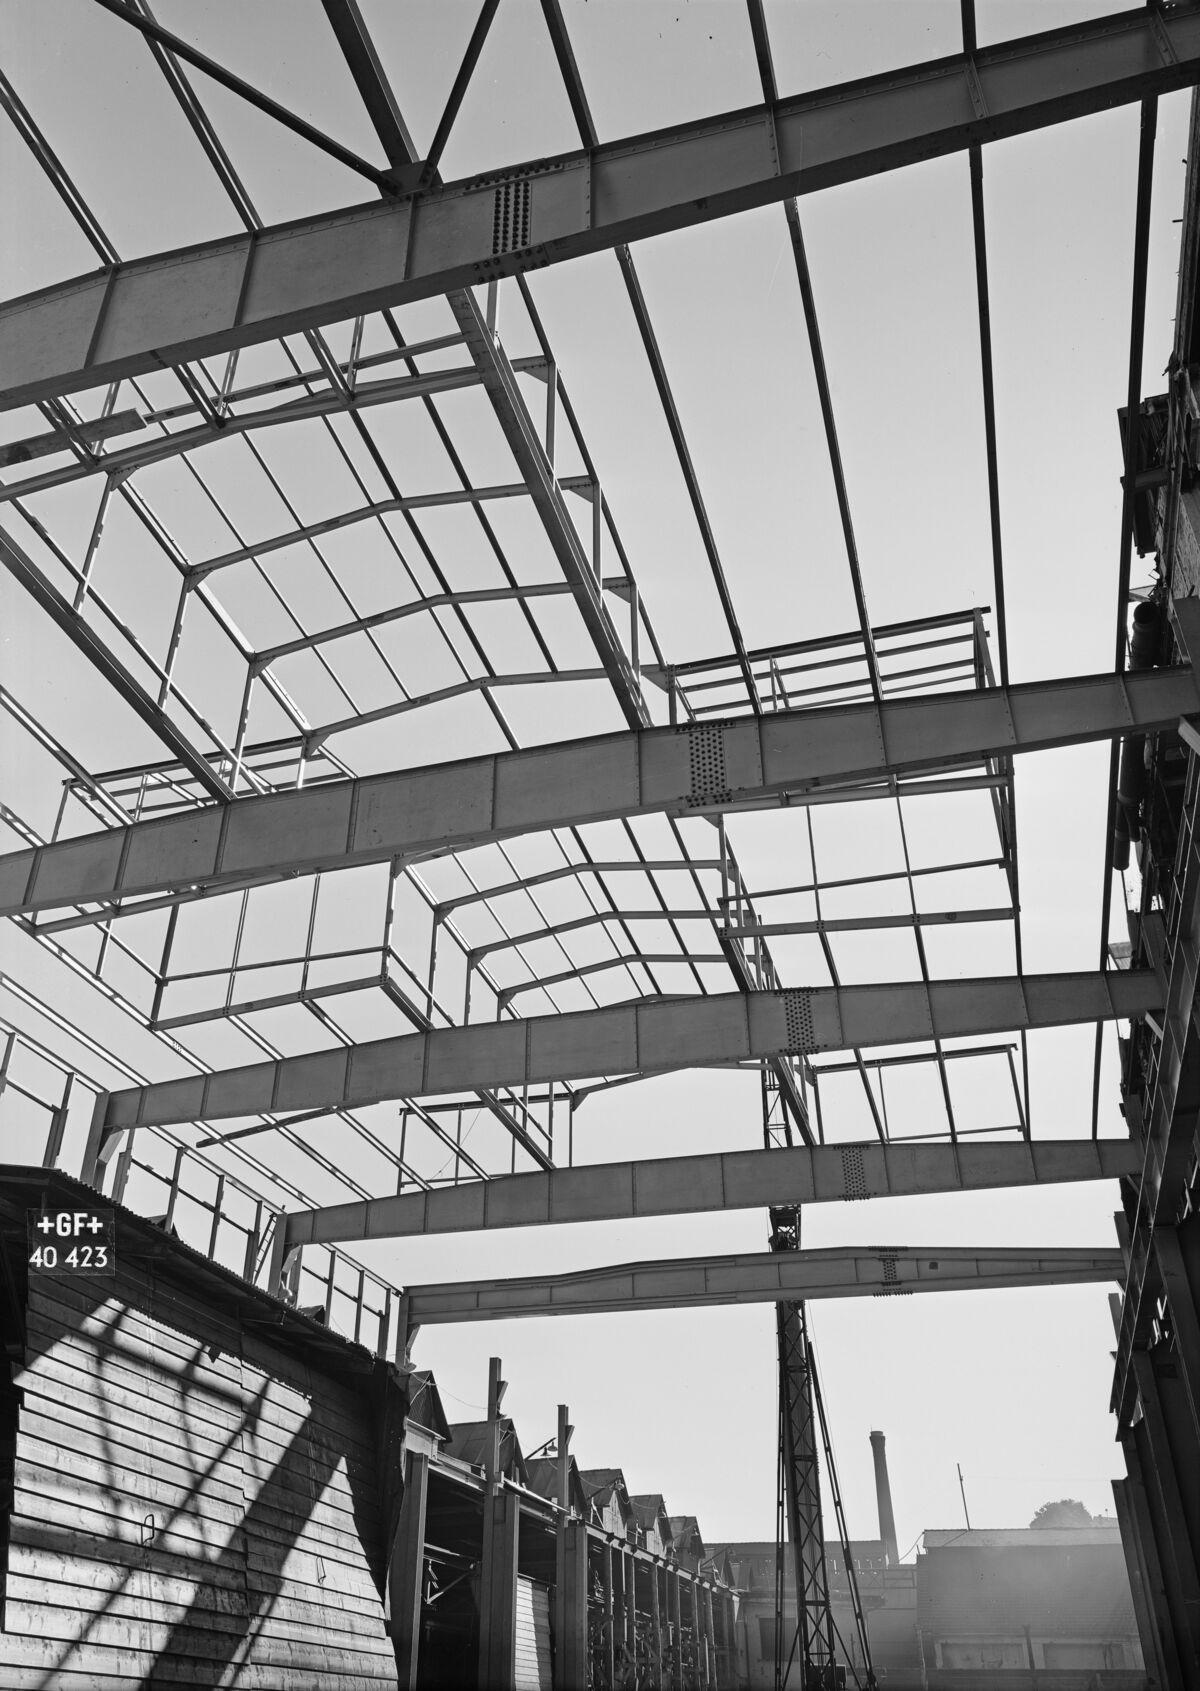 GFA 16/40423: Hall conversion: Set pillars in concrete